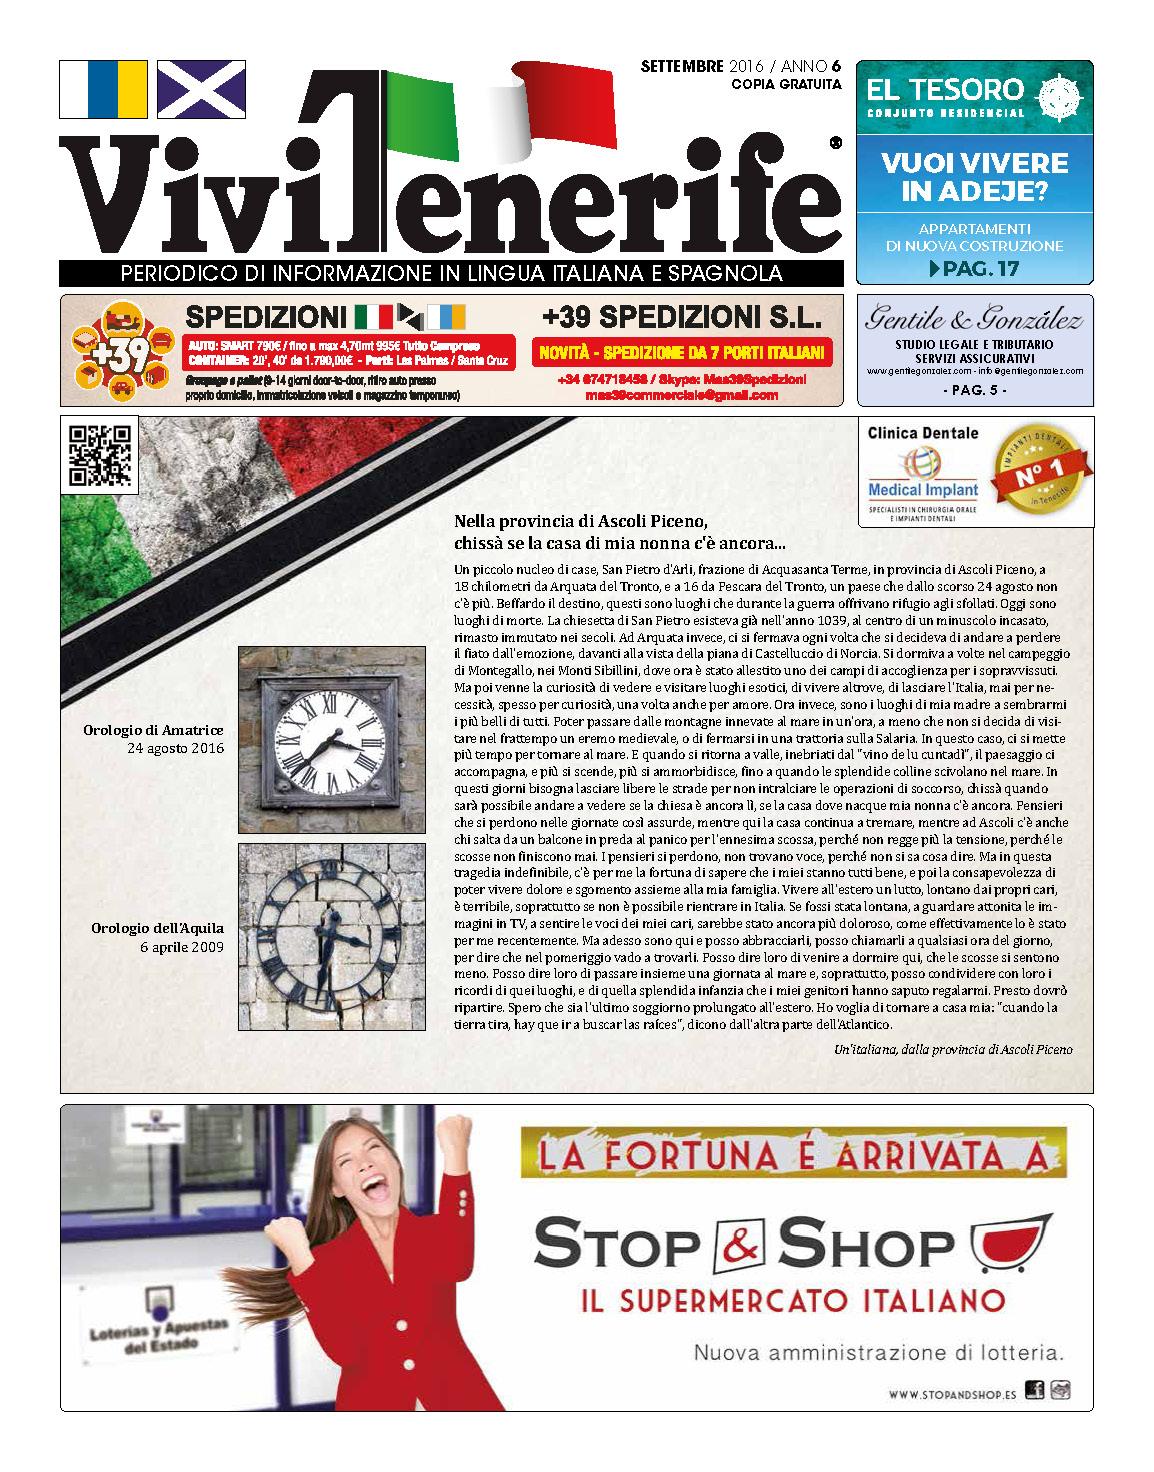 ViviTenerife Agosto 2016